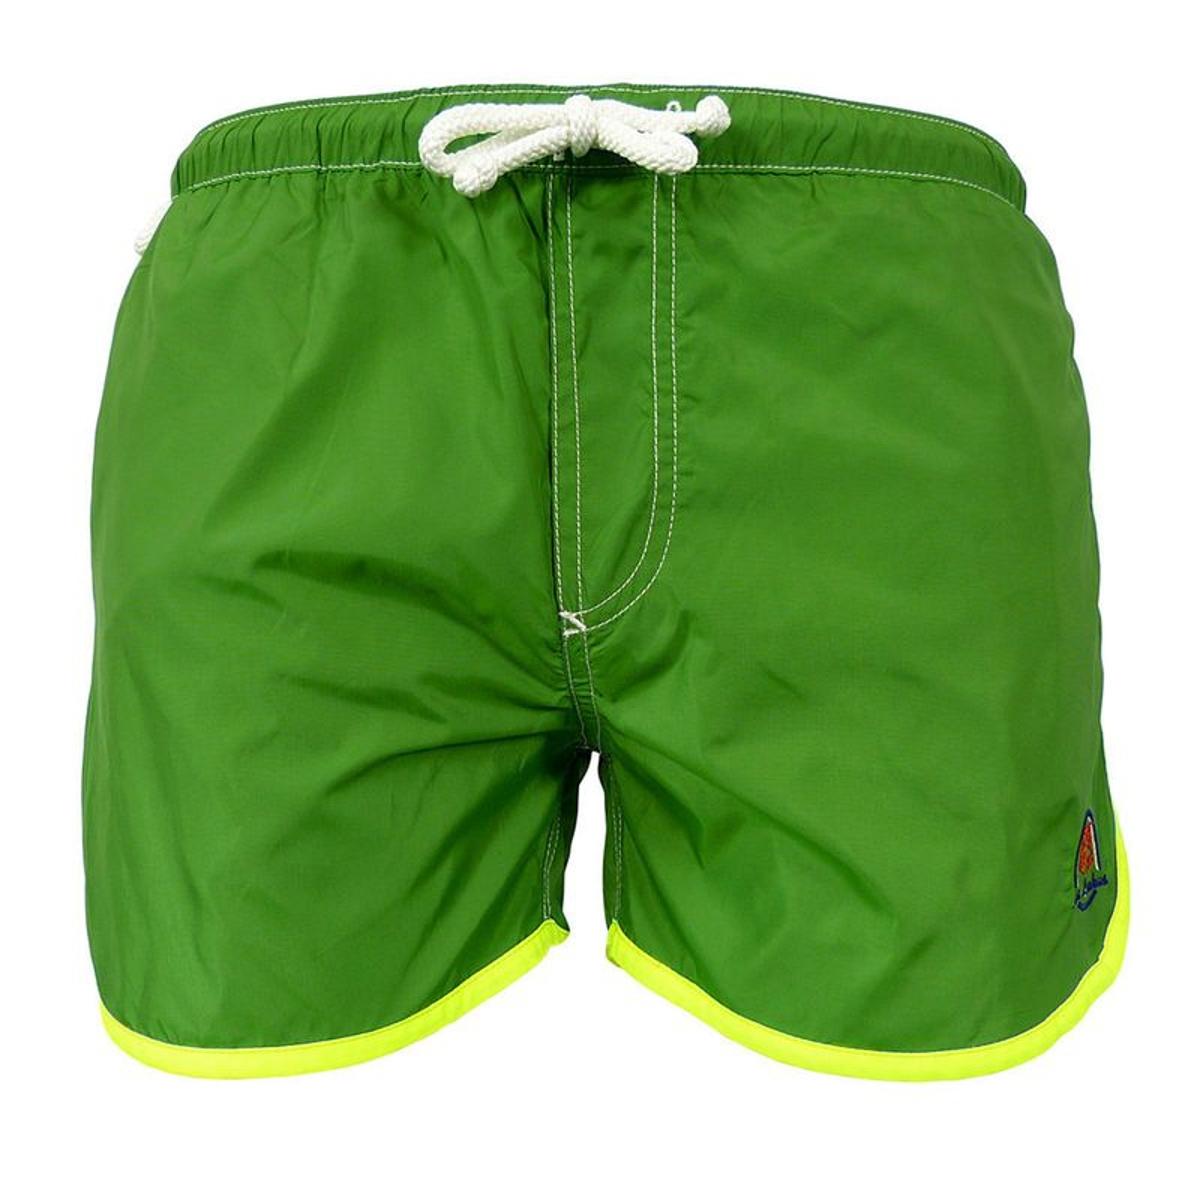 Maillot Short de bain homme Moréa sport - vert, gris, rouge ou bleu